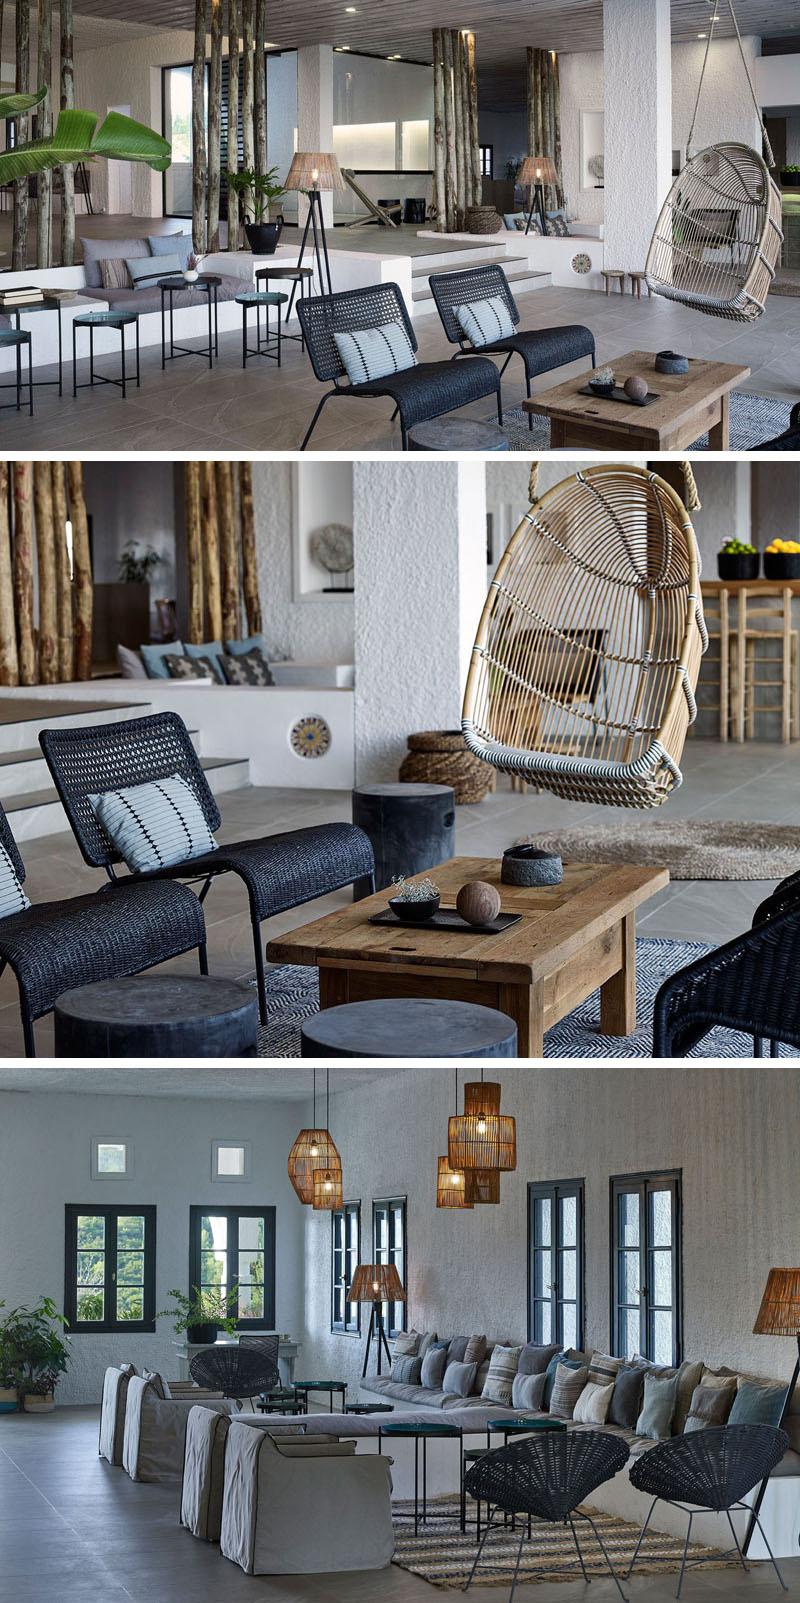 modern-hotel-lobby-greece-210217-1009-02